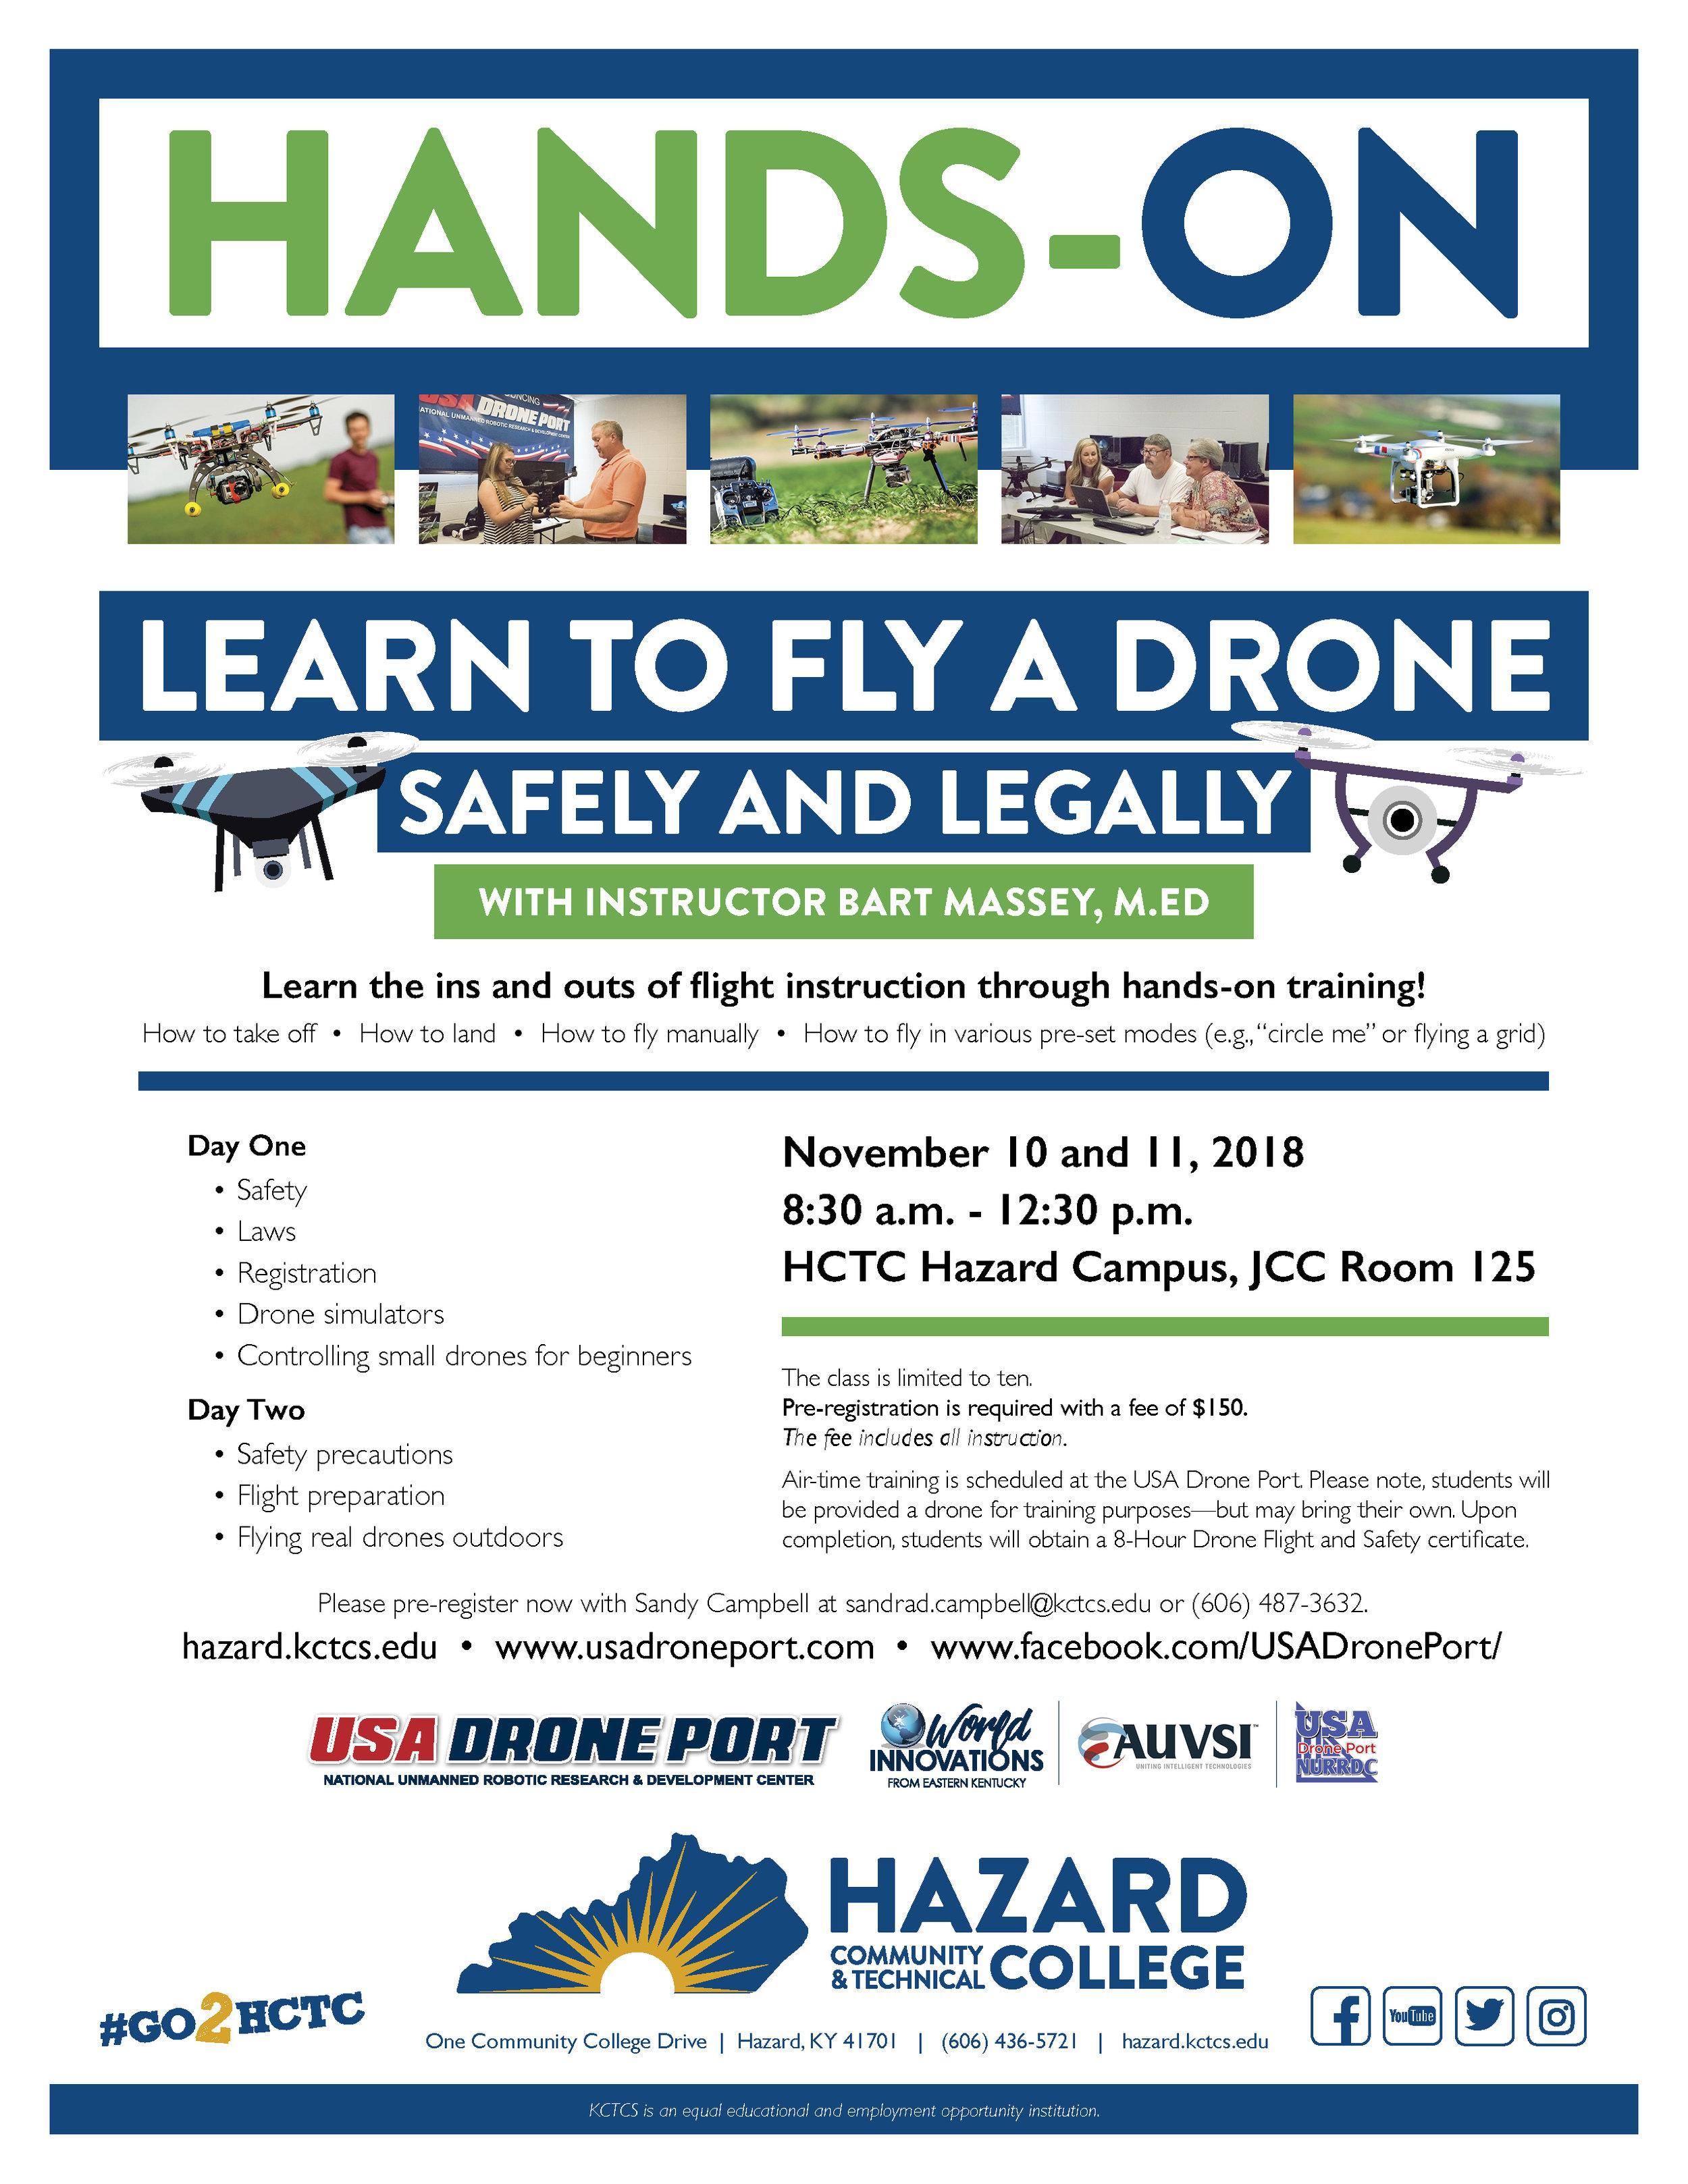 Hands-On Drone training flyer rv. 9-5-18.jpg